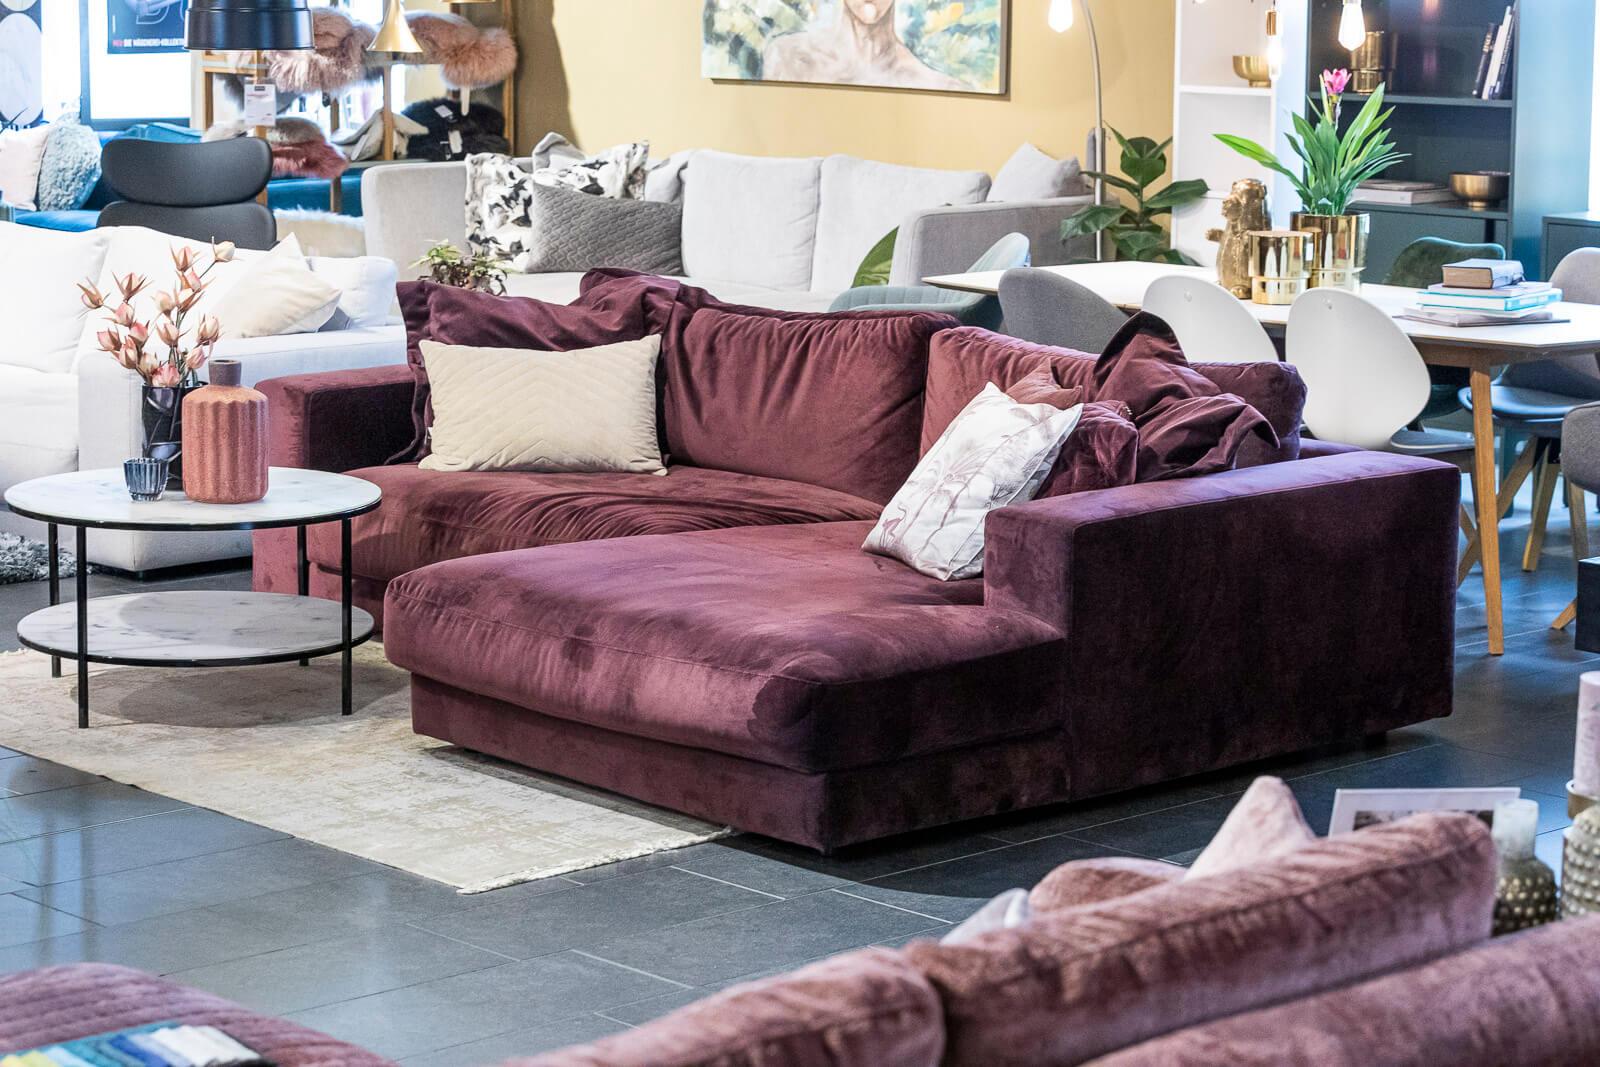 Full Size of Sofa Lila Lilah Corner Bed Emerald Craft Salon Lilac Covers Ikea Raymour 3 Piece Suite Chesterfield Samt Sleeper Chair And Flanigan Sofakombi Loft Ii Wscherei Sofa Sofa Lila